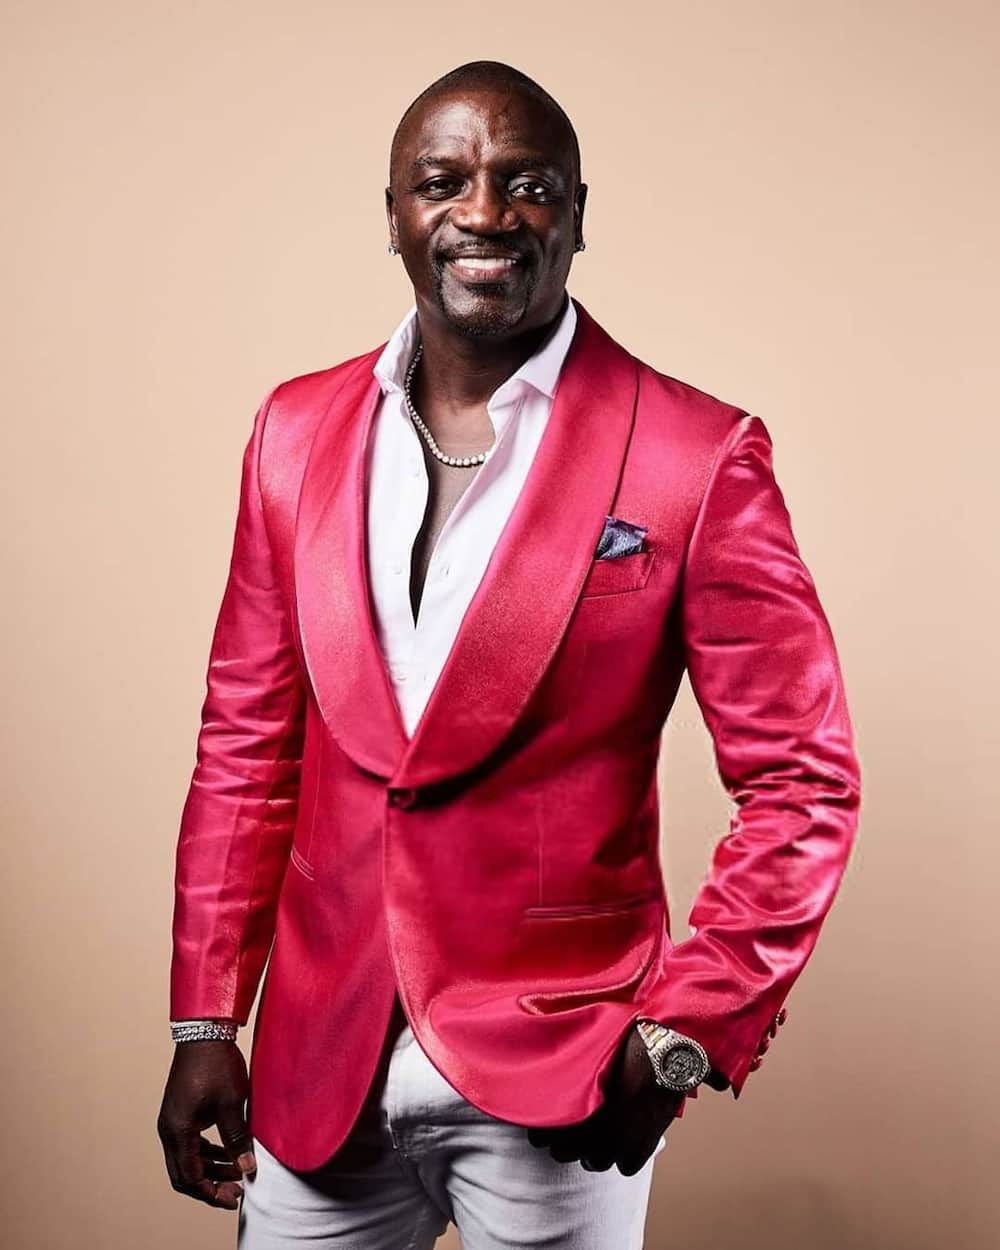 Fans react as Akon unveils his N2.3 trillion 'futuristic' city in Senegal (photos)